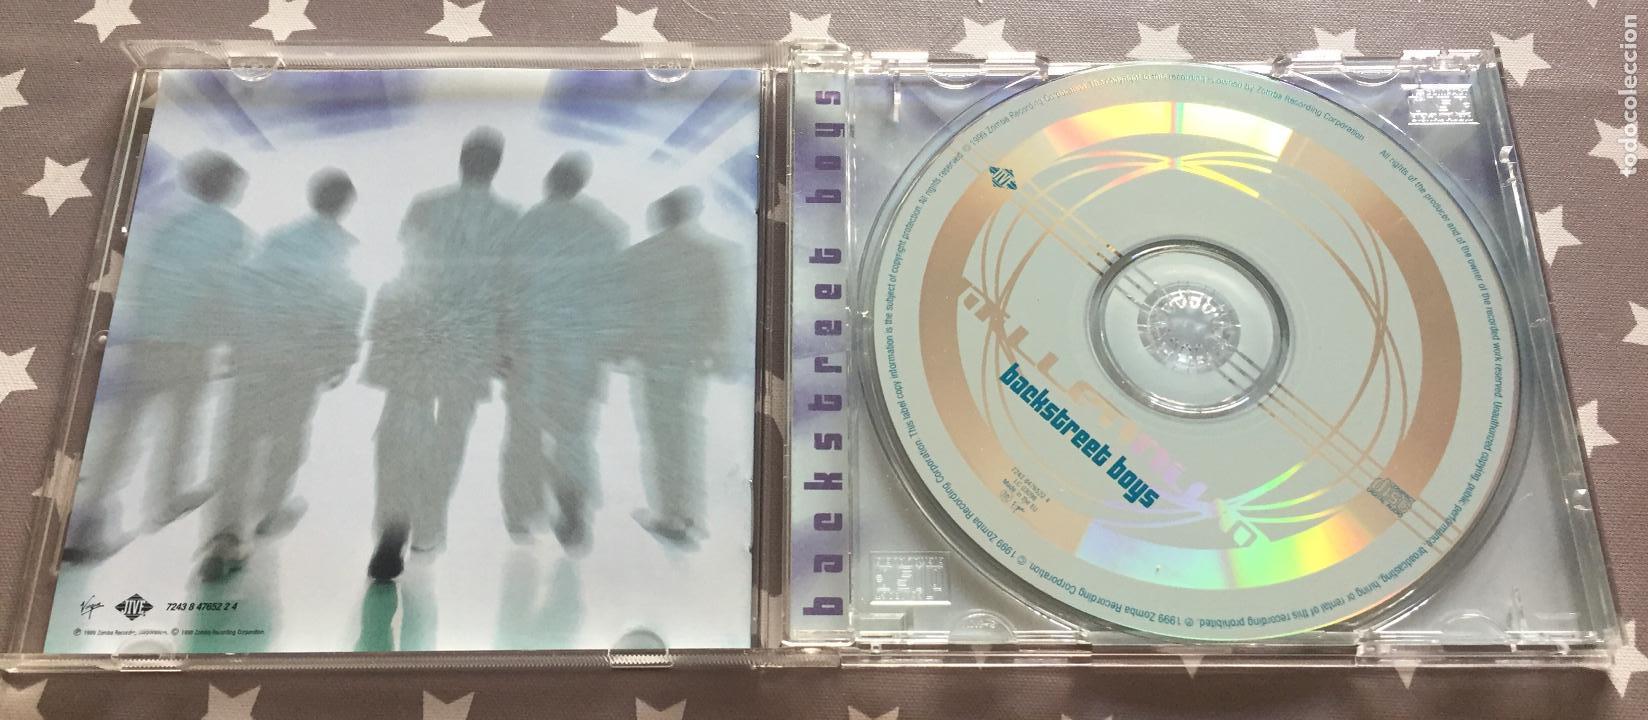 CDs de Música: BACKSTREET BOYS, Millennium - Foto 2 - 159762602